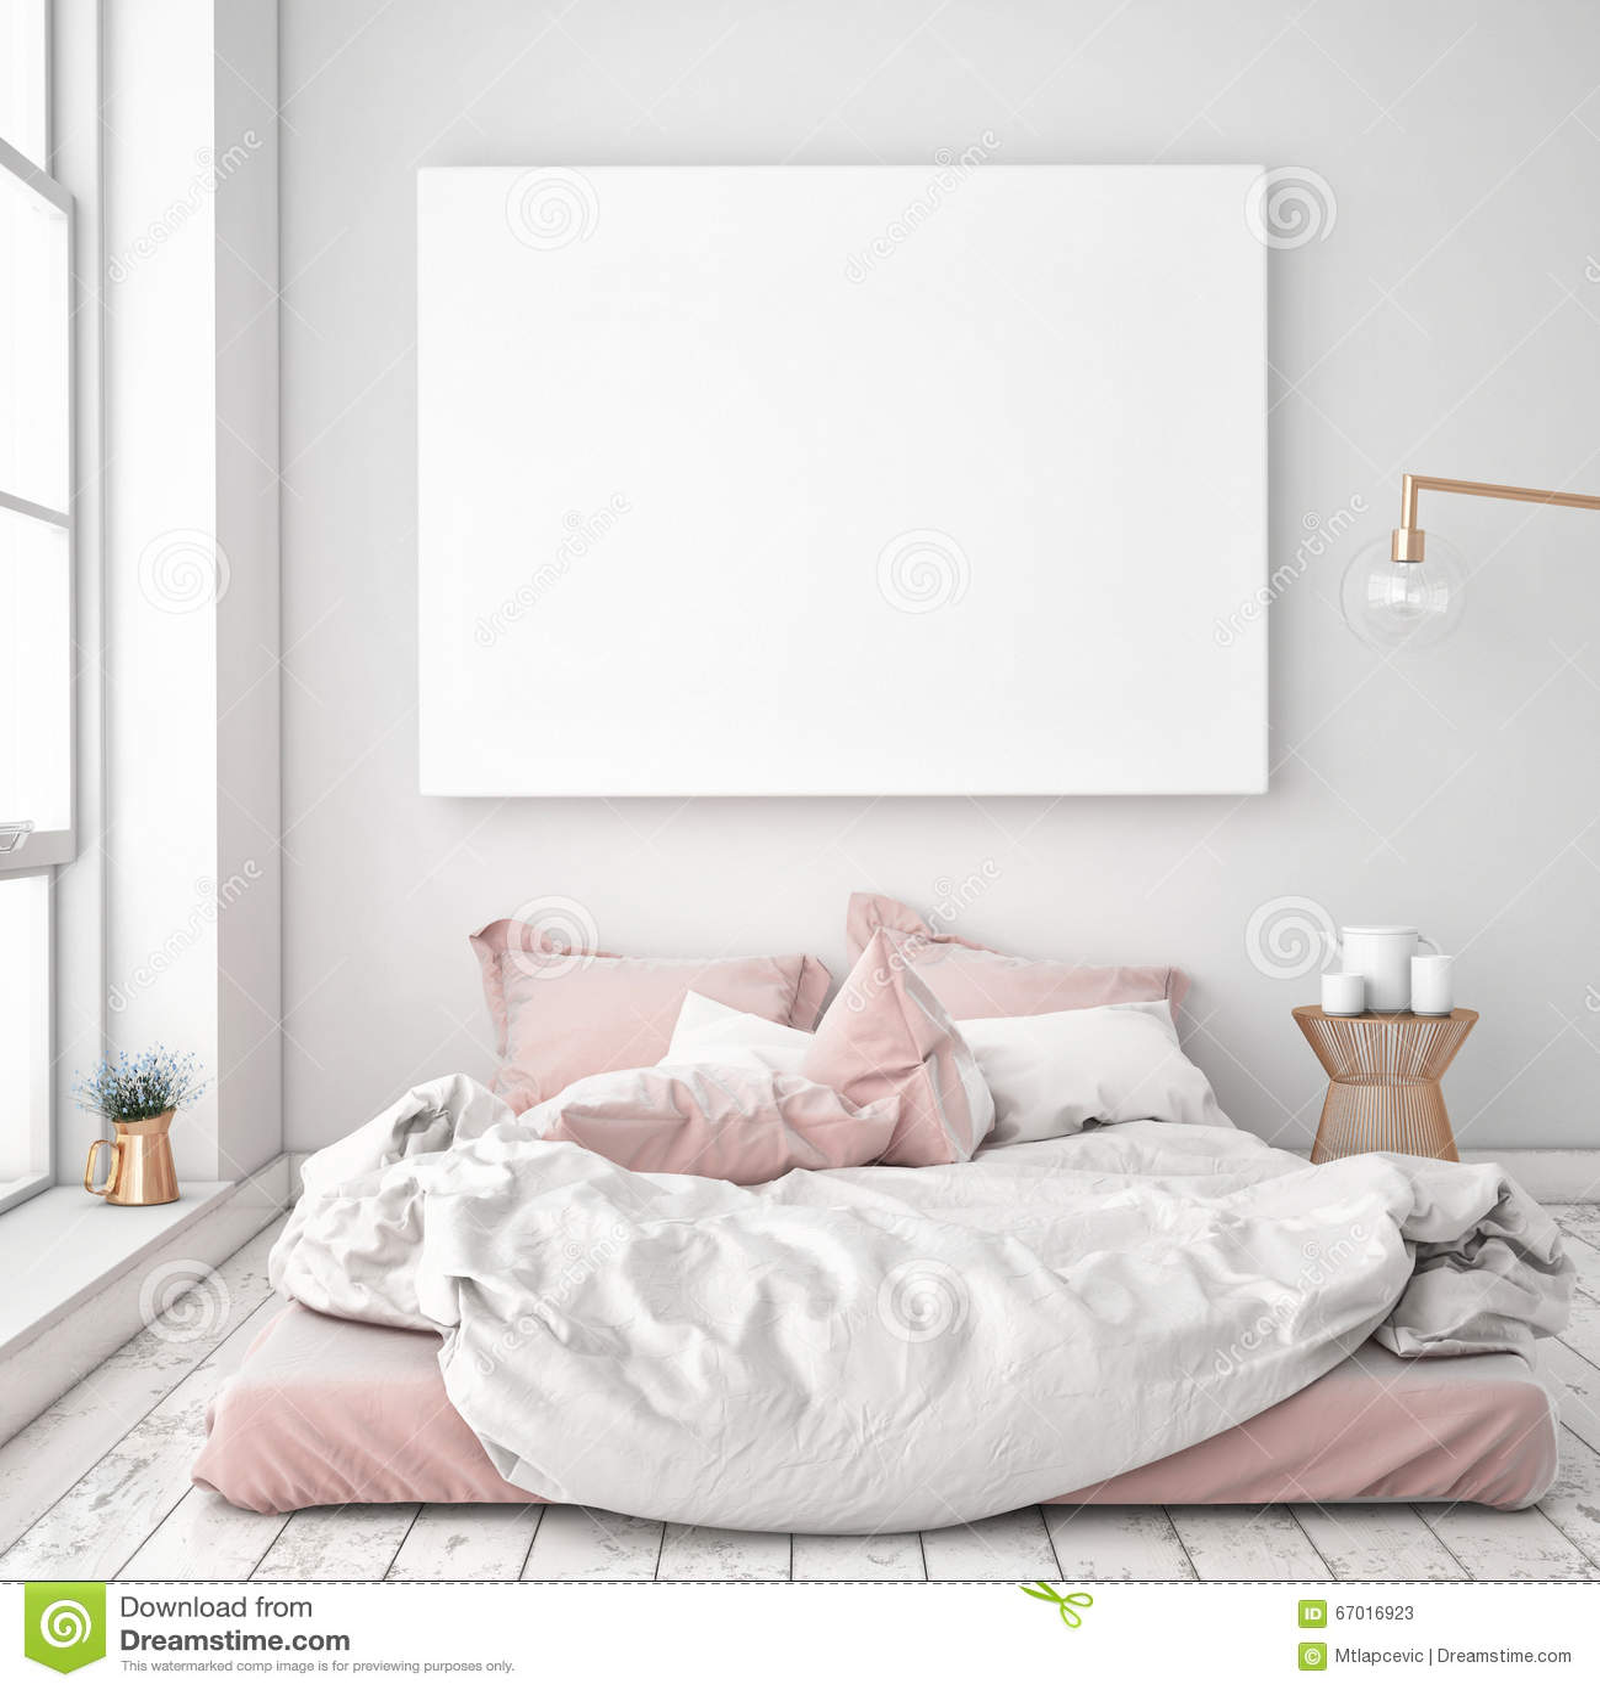 Kids Bedroom Wall Decor Bedroom Designs Latest Bedroom Ideas For Quadruplets Bedroom Blue Carpet: Bedroom Royalty-Free Stock Photography